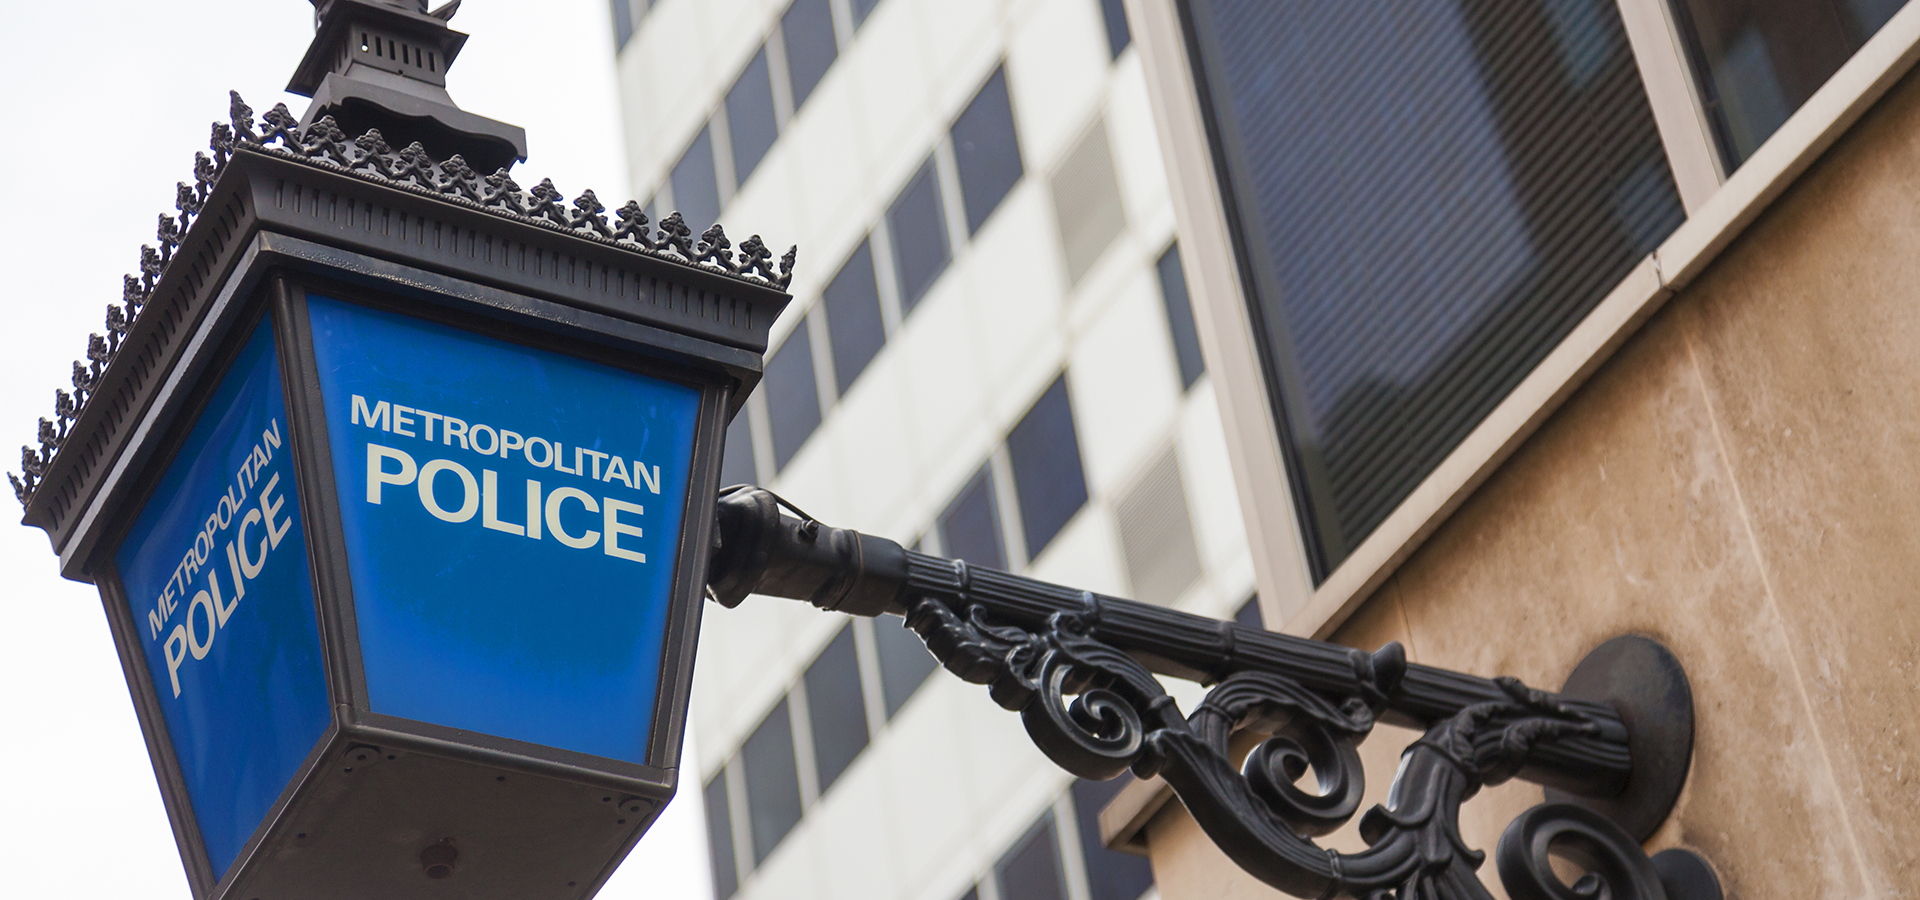 £250m Metropolitan Police framework win image